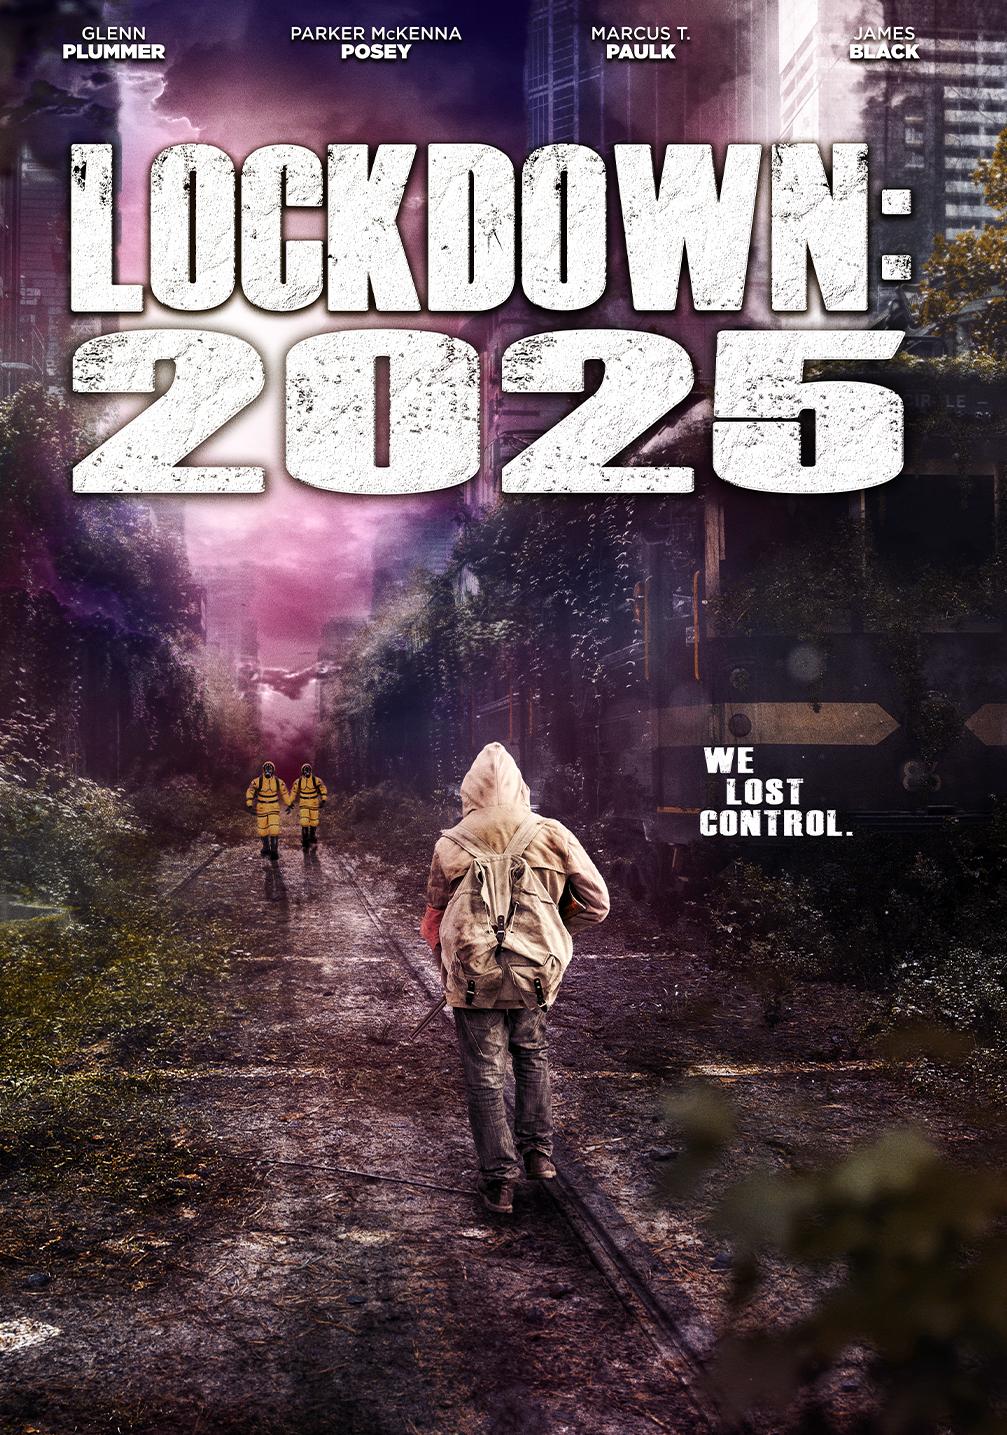 Lockdown 2025 (2021) Telugu Dubbed (Voice Over) & English [Dual Audio] WebRip 720p [1XBET]